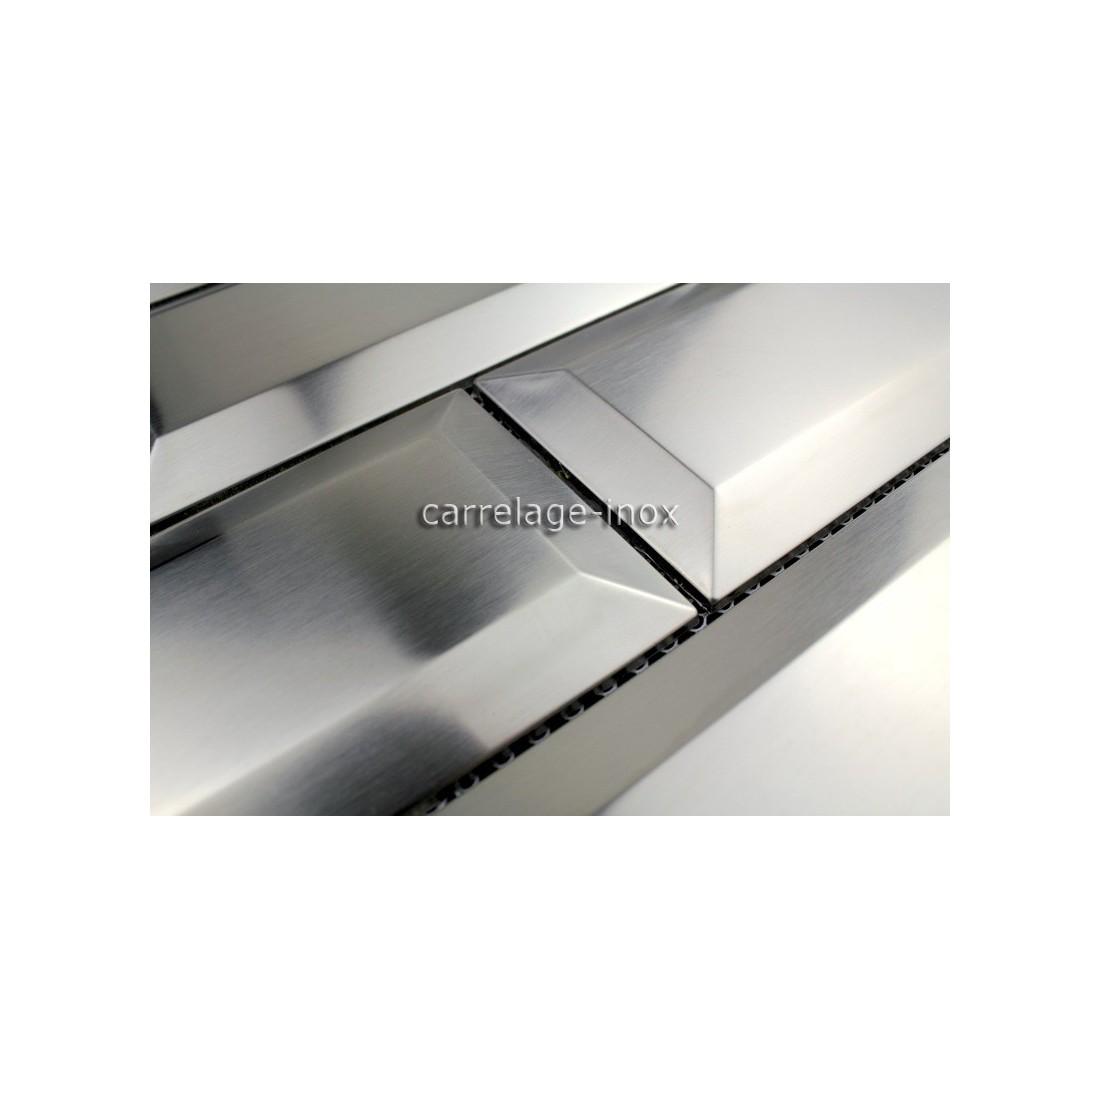 Carrelage design carrelage mosaique pas cher moderne design pour carrelage de sol et for Carrelage inox pas cher